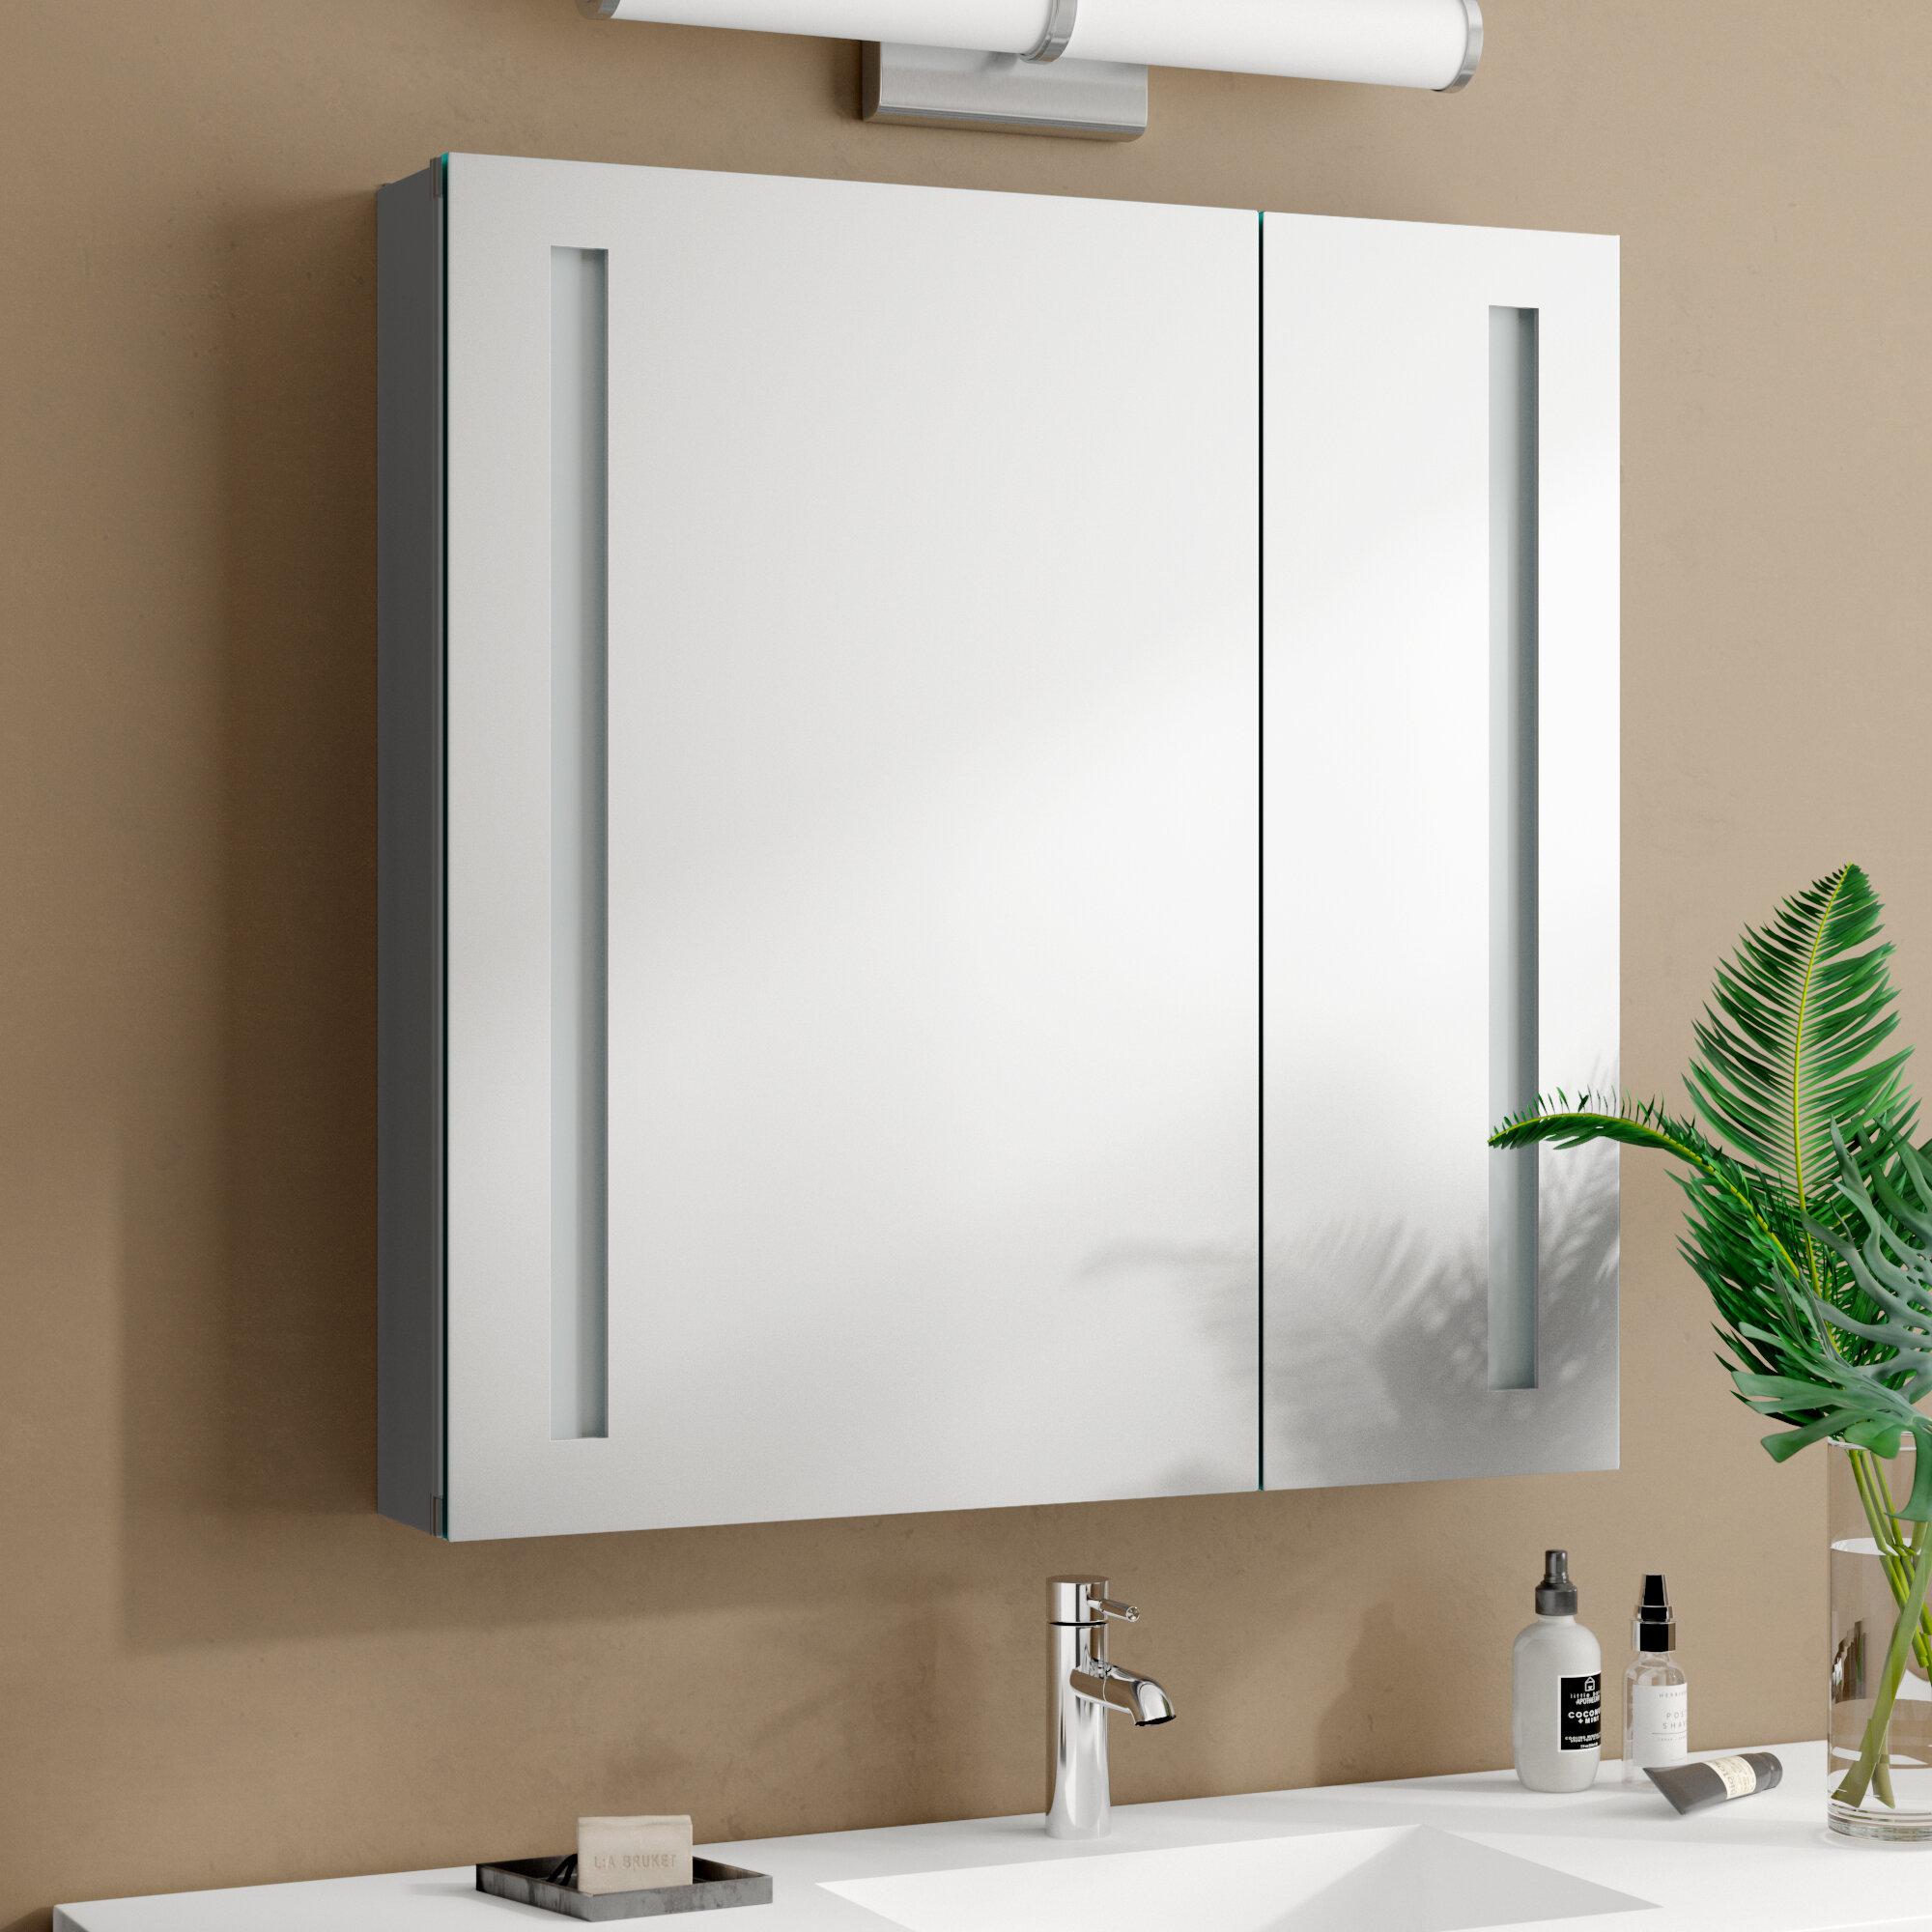 Orren Ellis Dili Recessed Or Surface Mount Frameless 2 Door Medicine Cabinet With 3 Adjustable Shelves And Led Lighting Reviews Wayfair